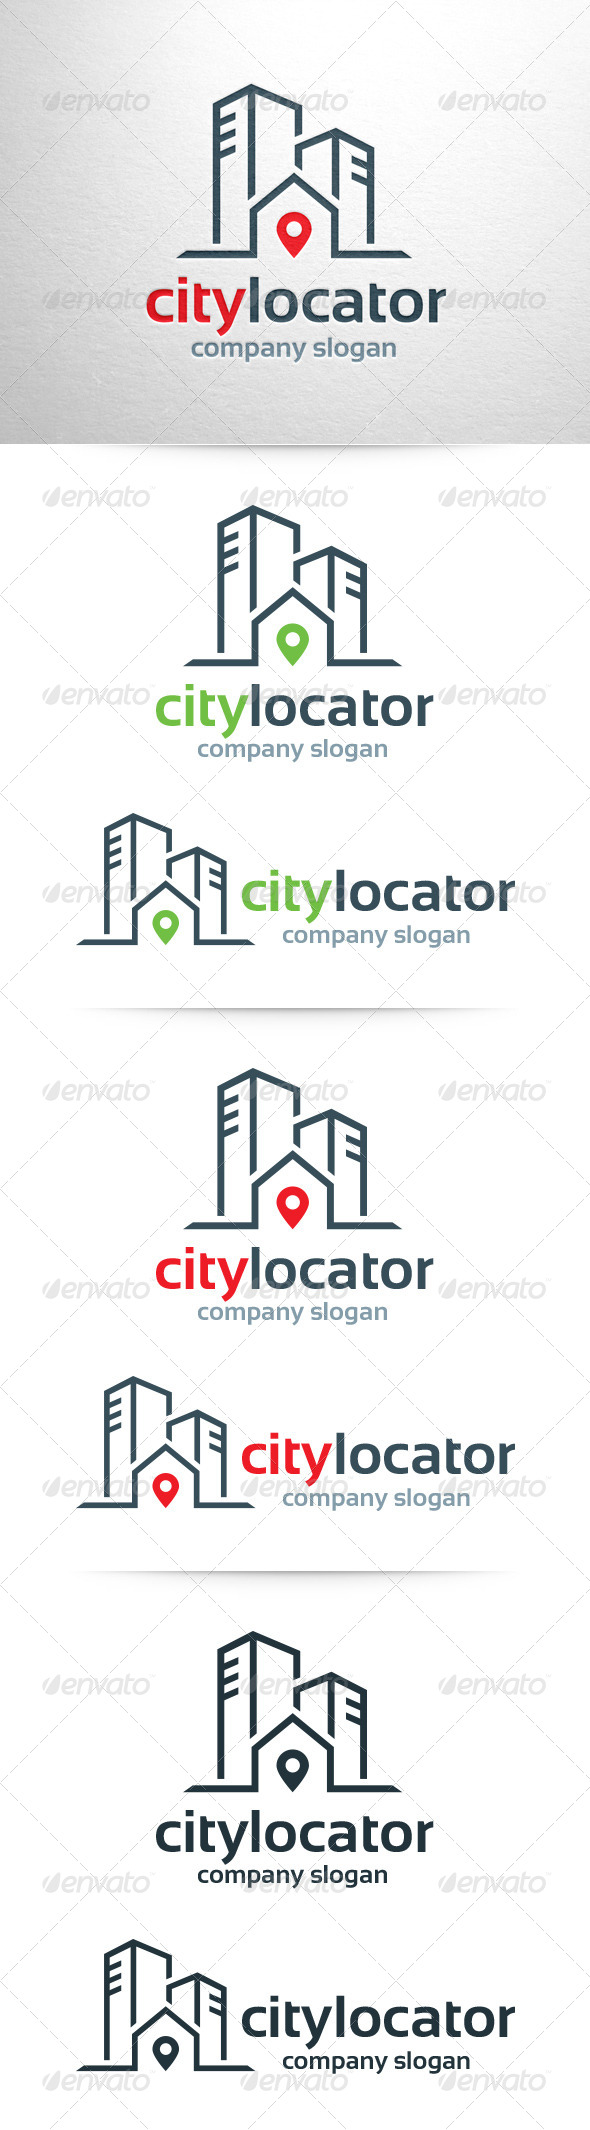 GraphicRiver City Locator Logo Template 6614567